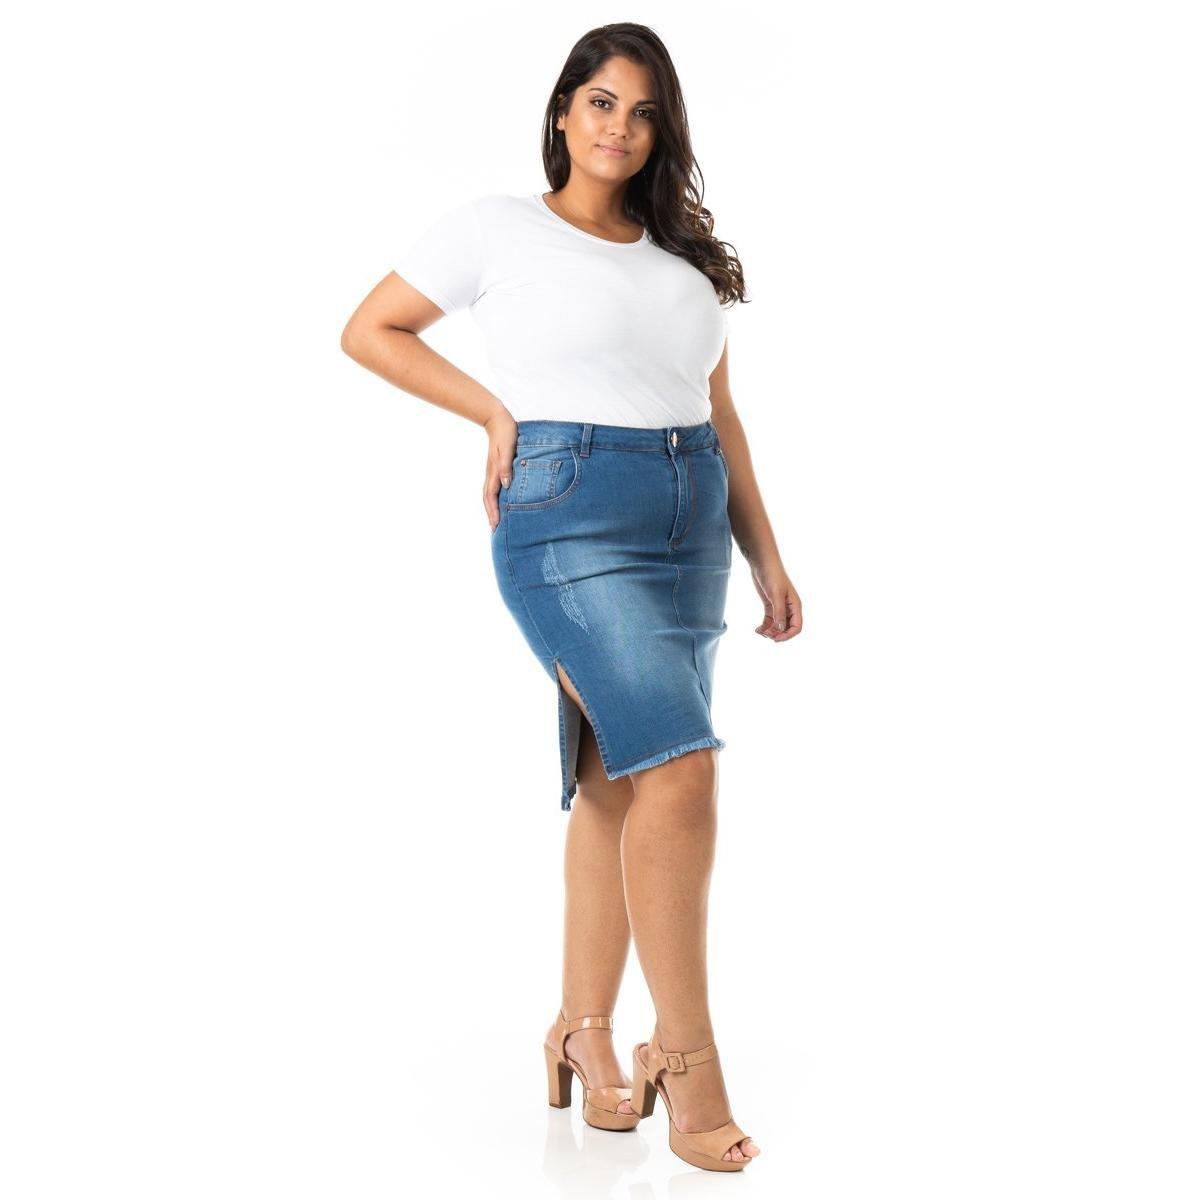 Saia Midi Jeans com Fenda Lateral Plus Size Confidencial Extra Feminina - Azul